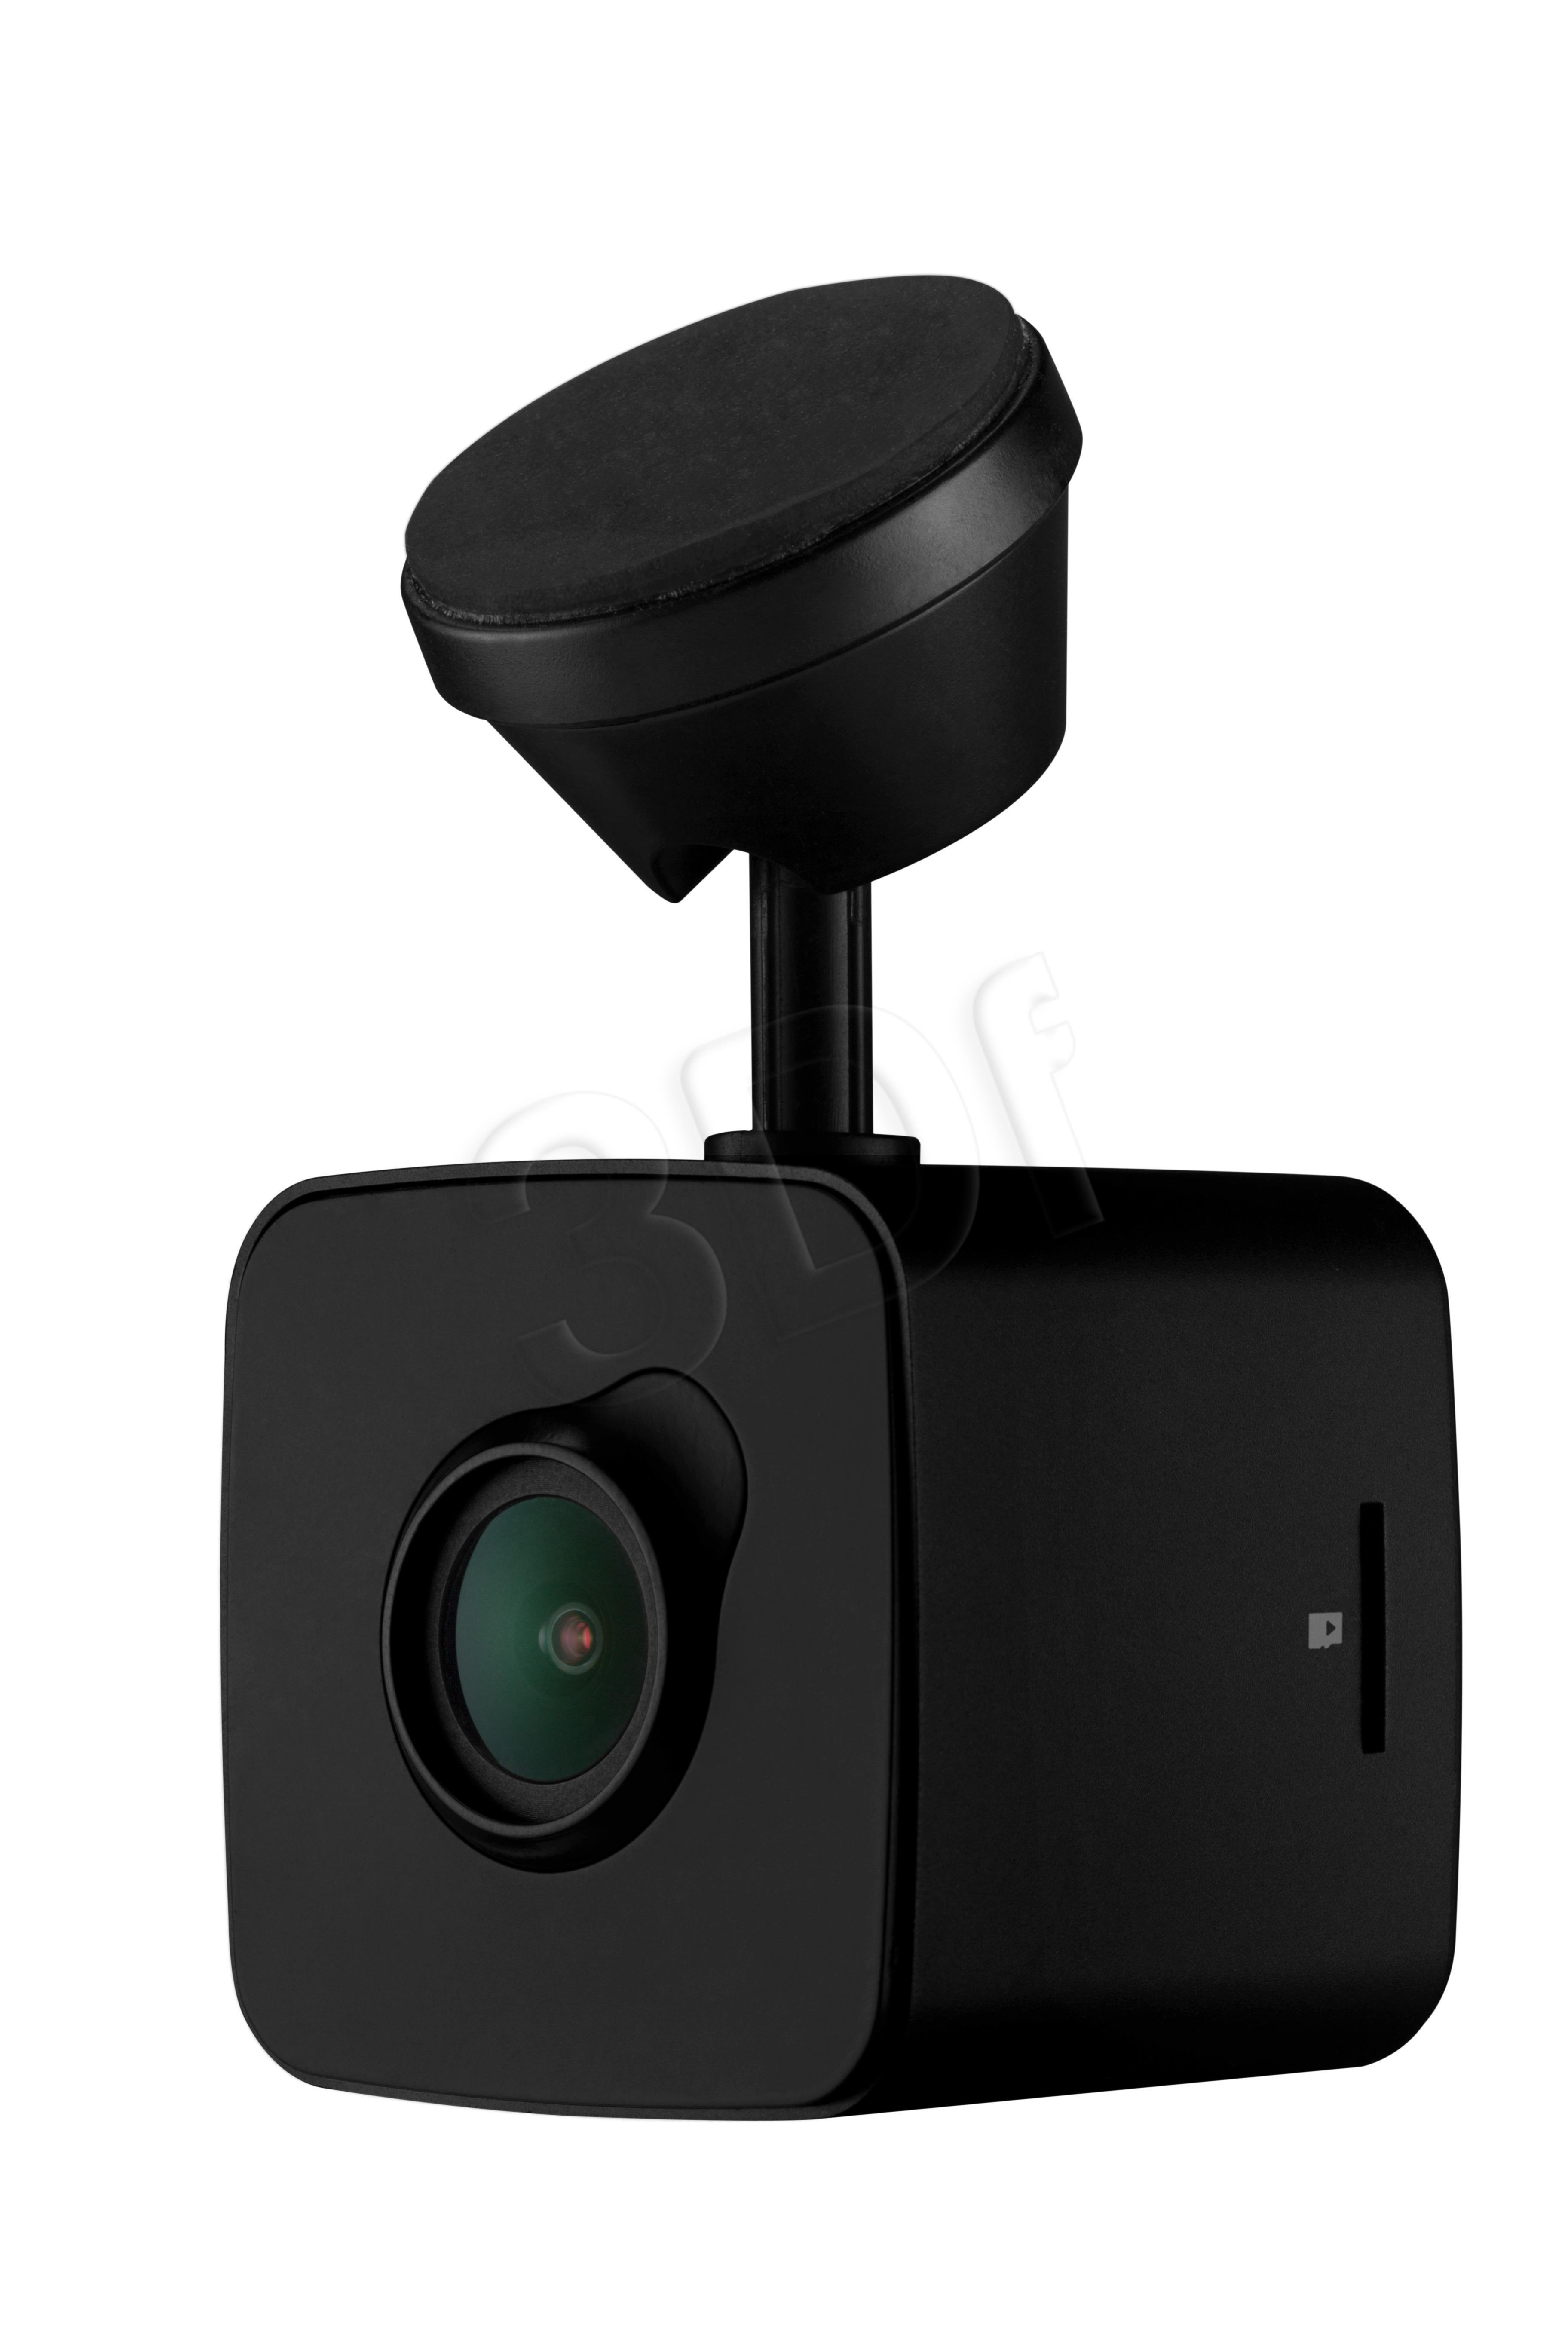 Car Video Recorder PRESTIGIO RoadRunner CUBE (FHD 1920x1080@30fps, 1.5 inch screen, 2 MP CMOS SONY IMX323 image sensor, 2 MP camera, 140° Vi videoreģistrātors